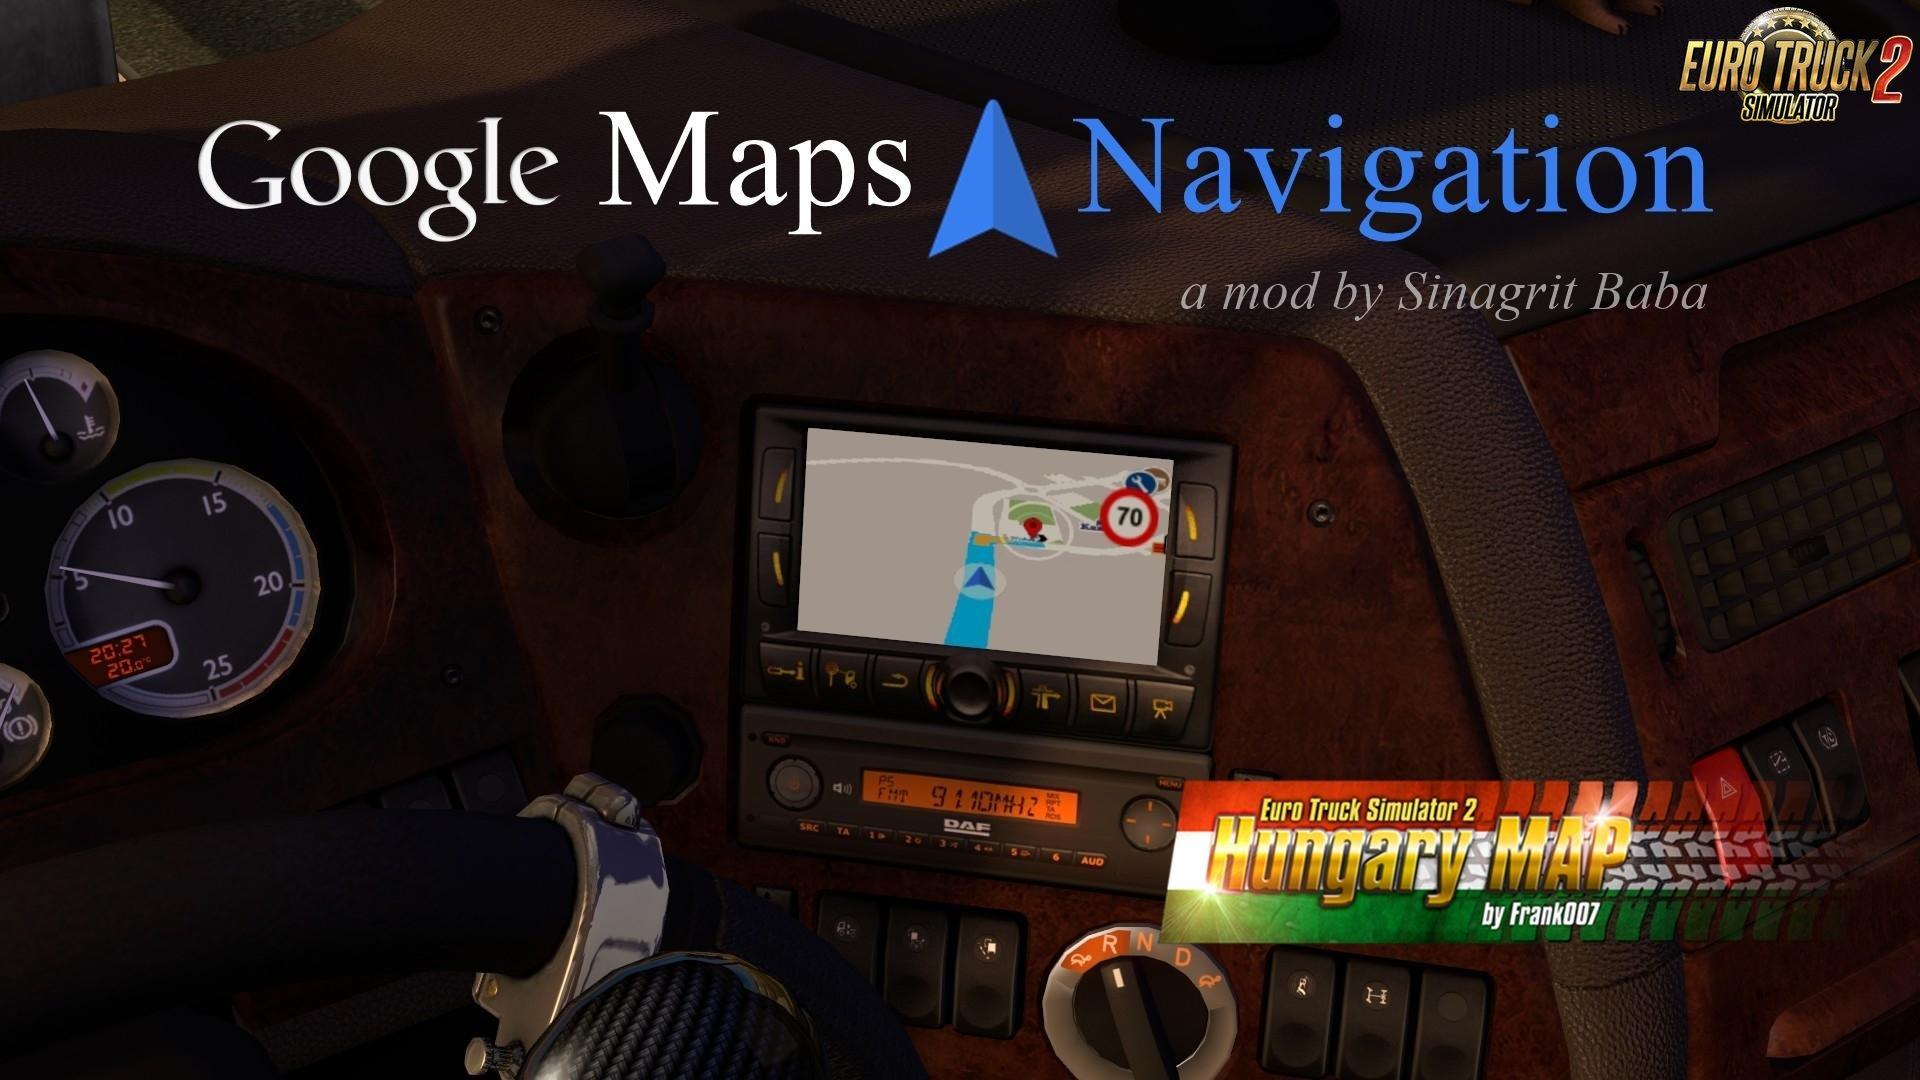 Google Maps Navigation Normal and Night Version Map Mods Addons v2.0